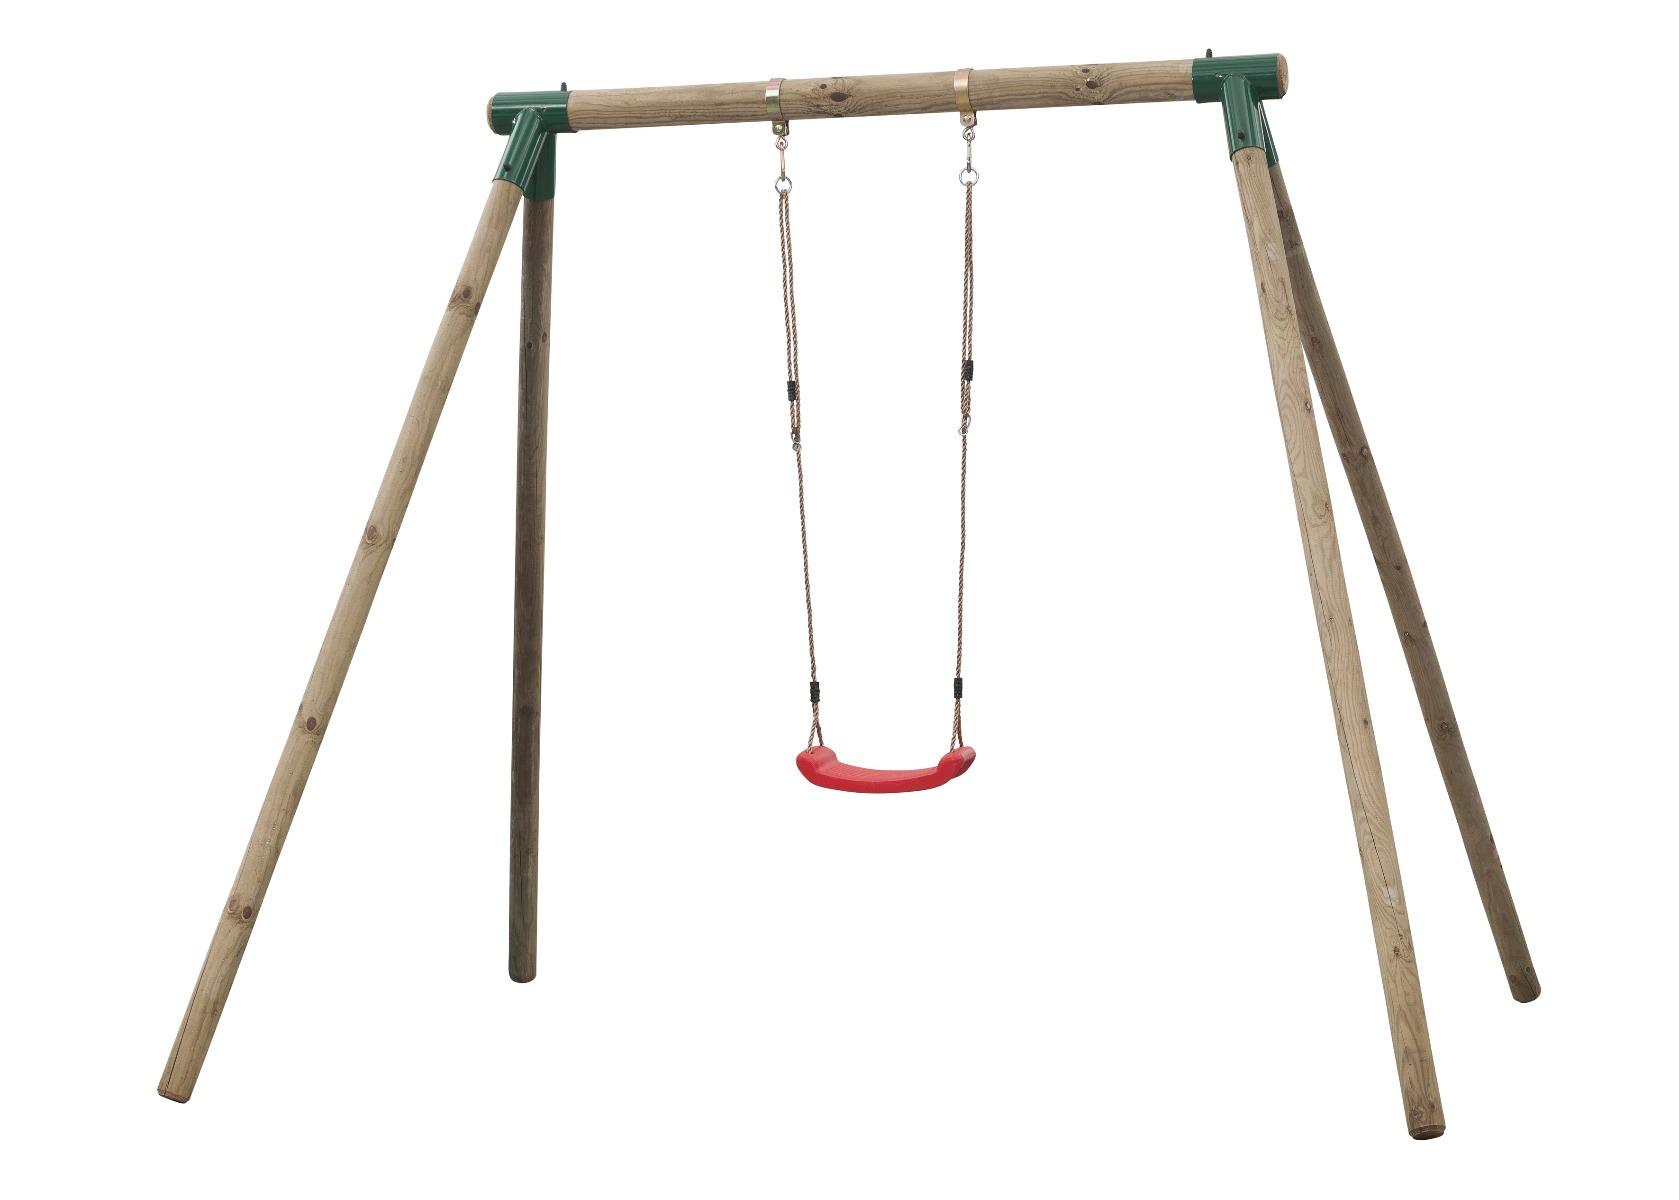 Holzschaukel Spielgerät Alicia 240x220x220cm